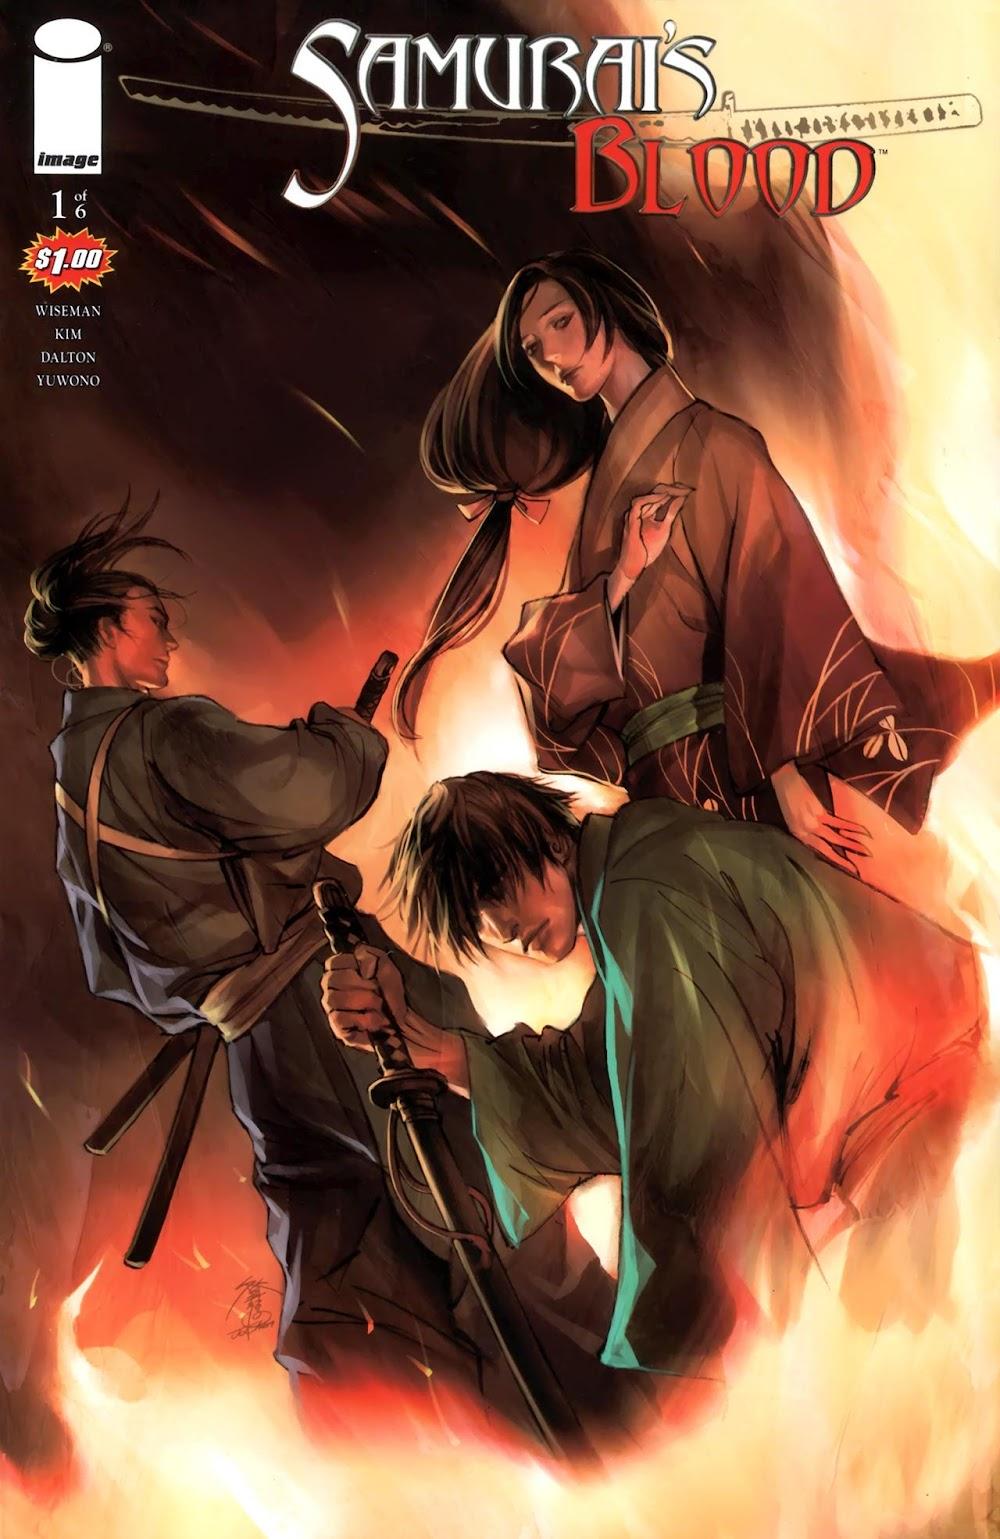 Samurai's Blood (2011) - complete